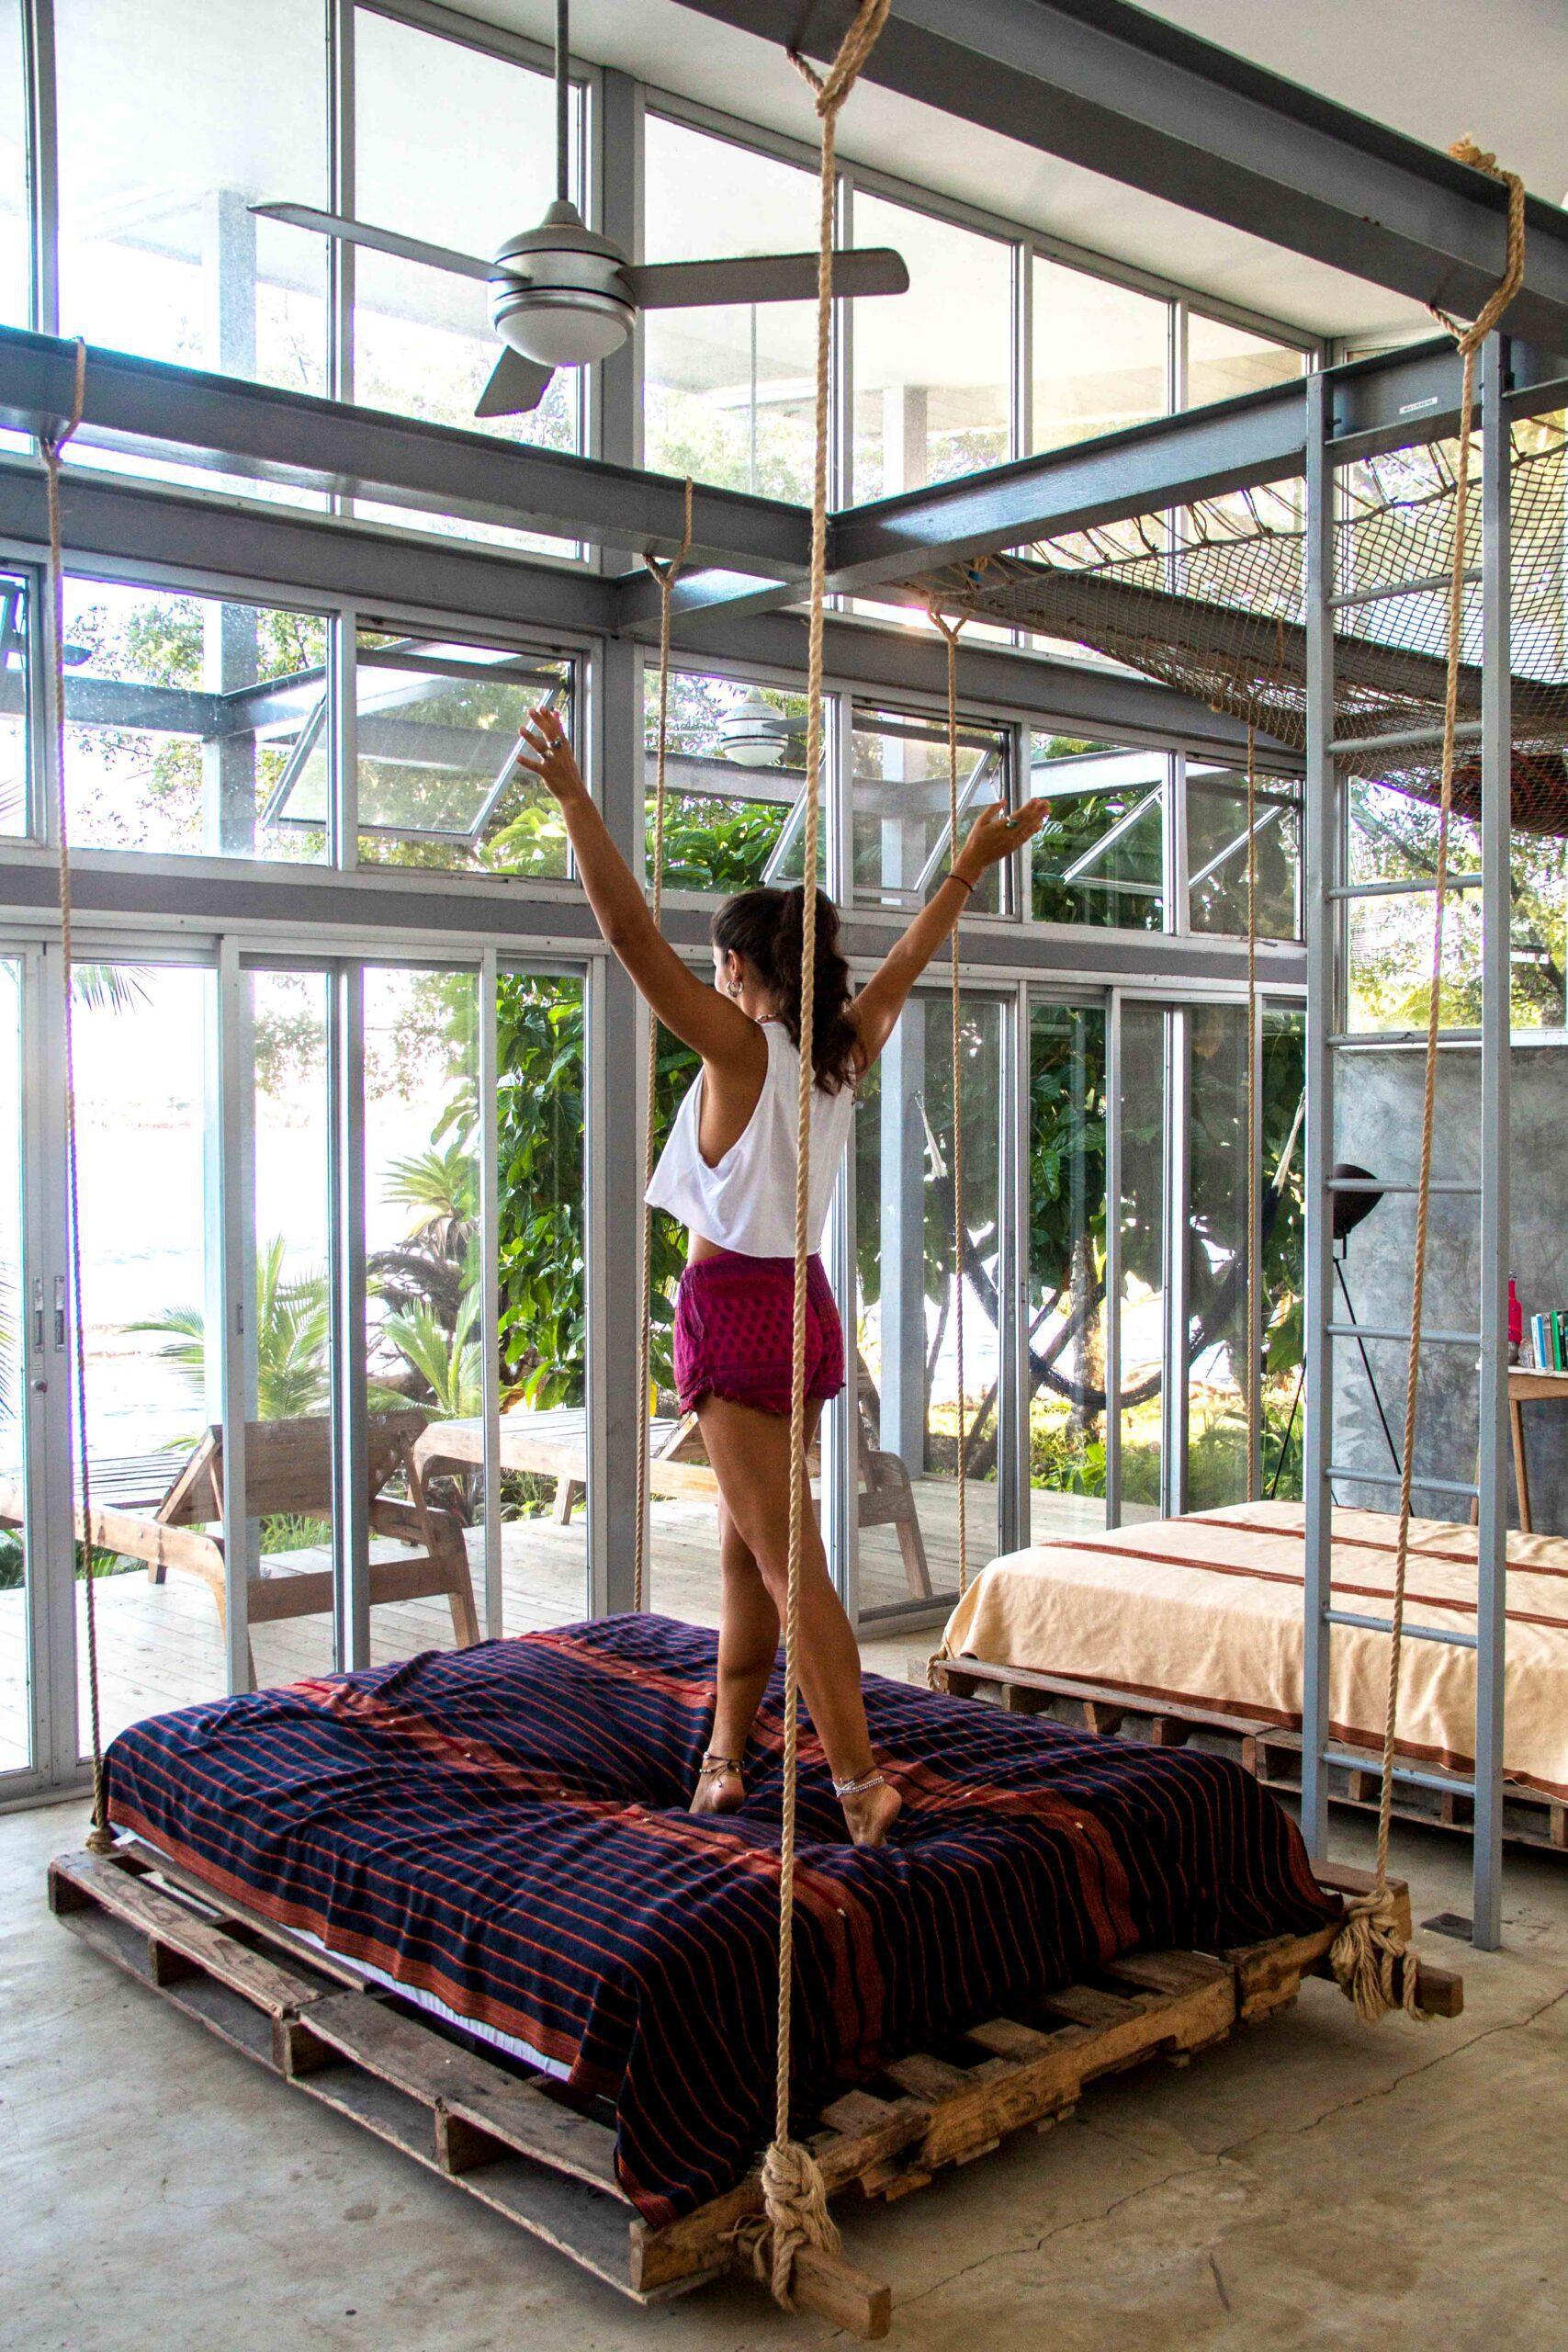 Hanging hammock at Casa Comunal Bocas del Toro